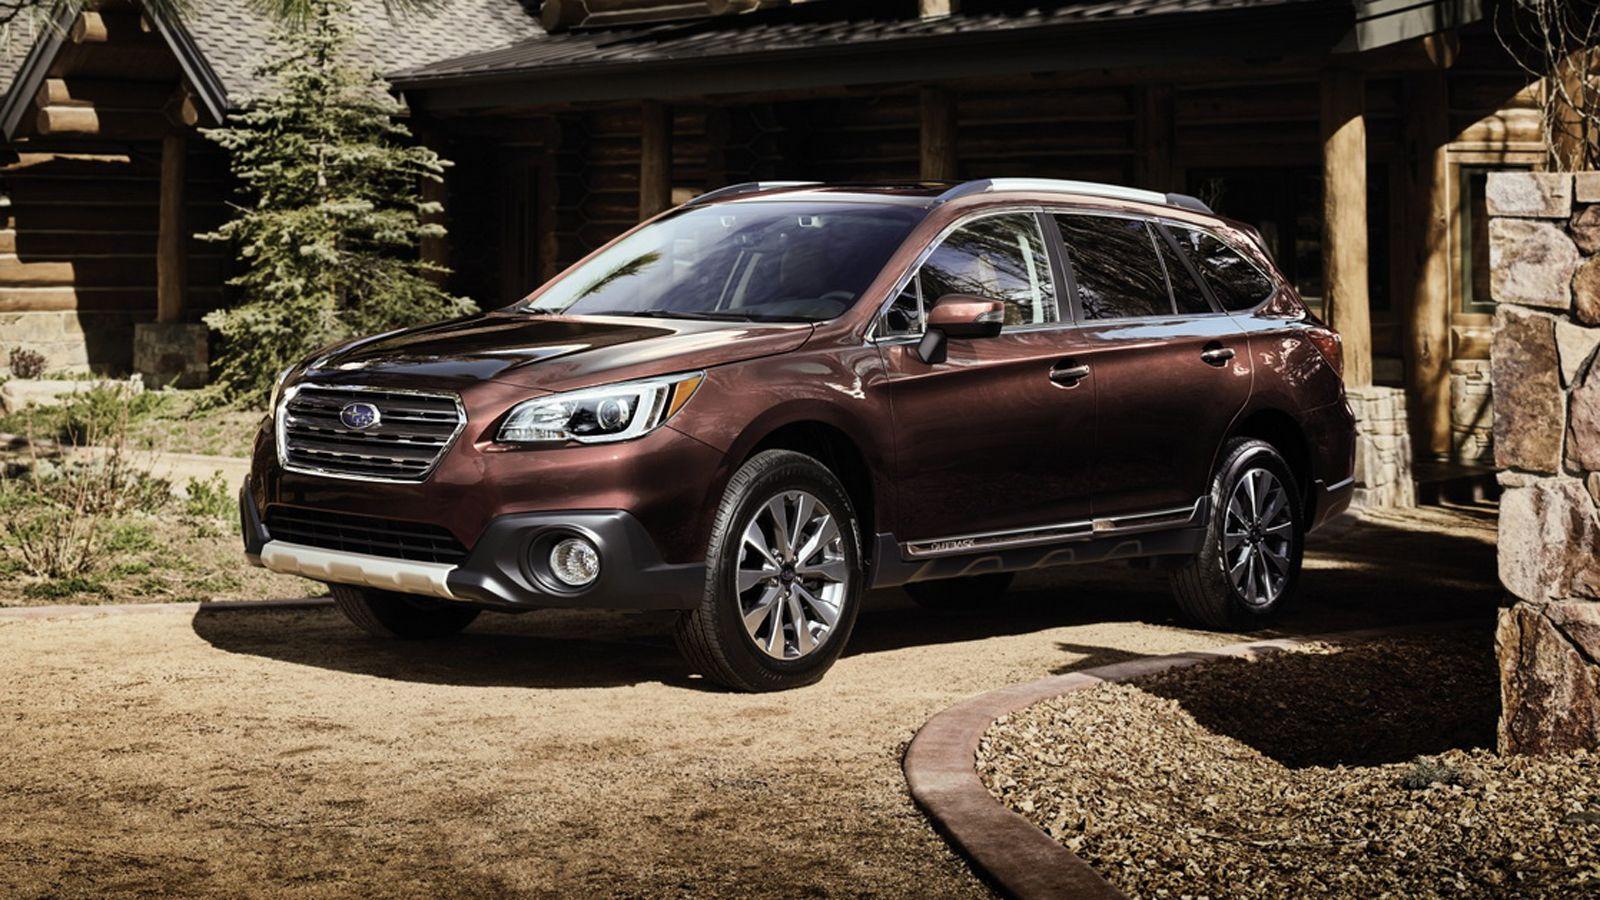 Subaru - subaru legacy, subaru outback